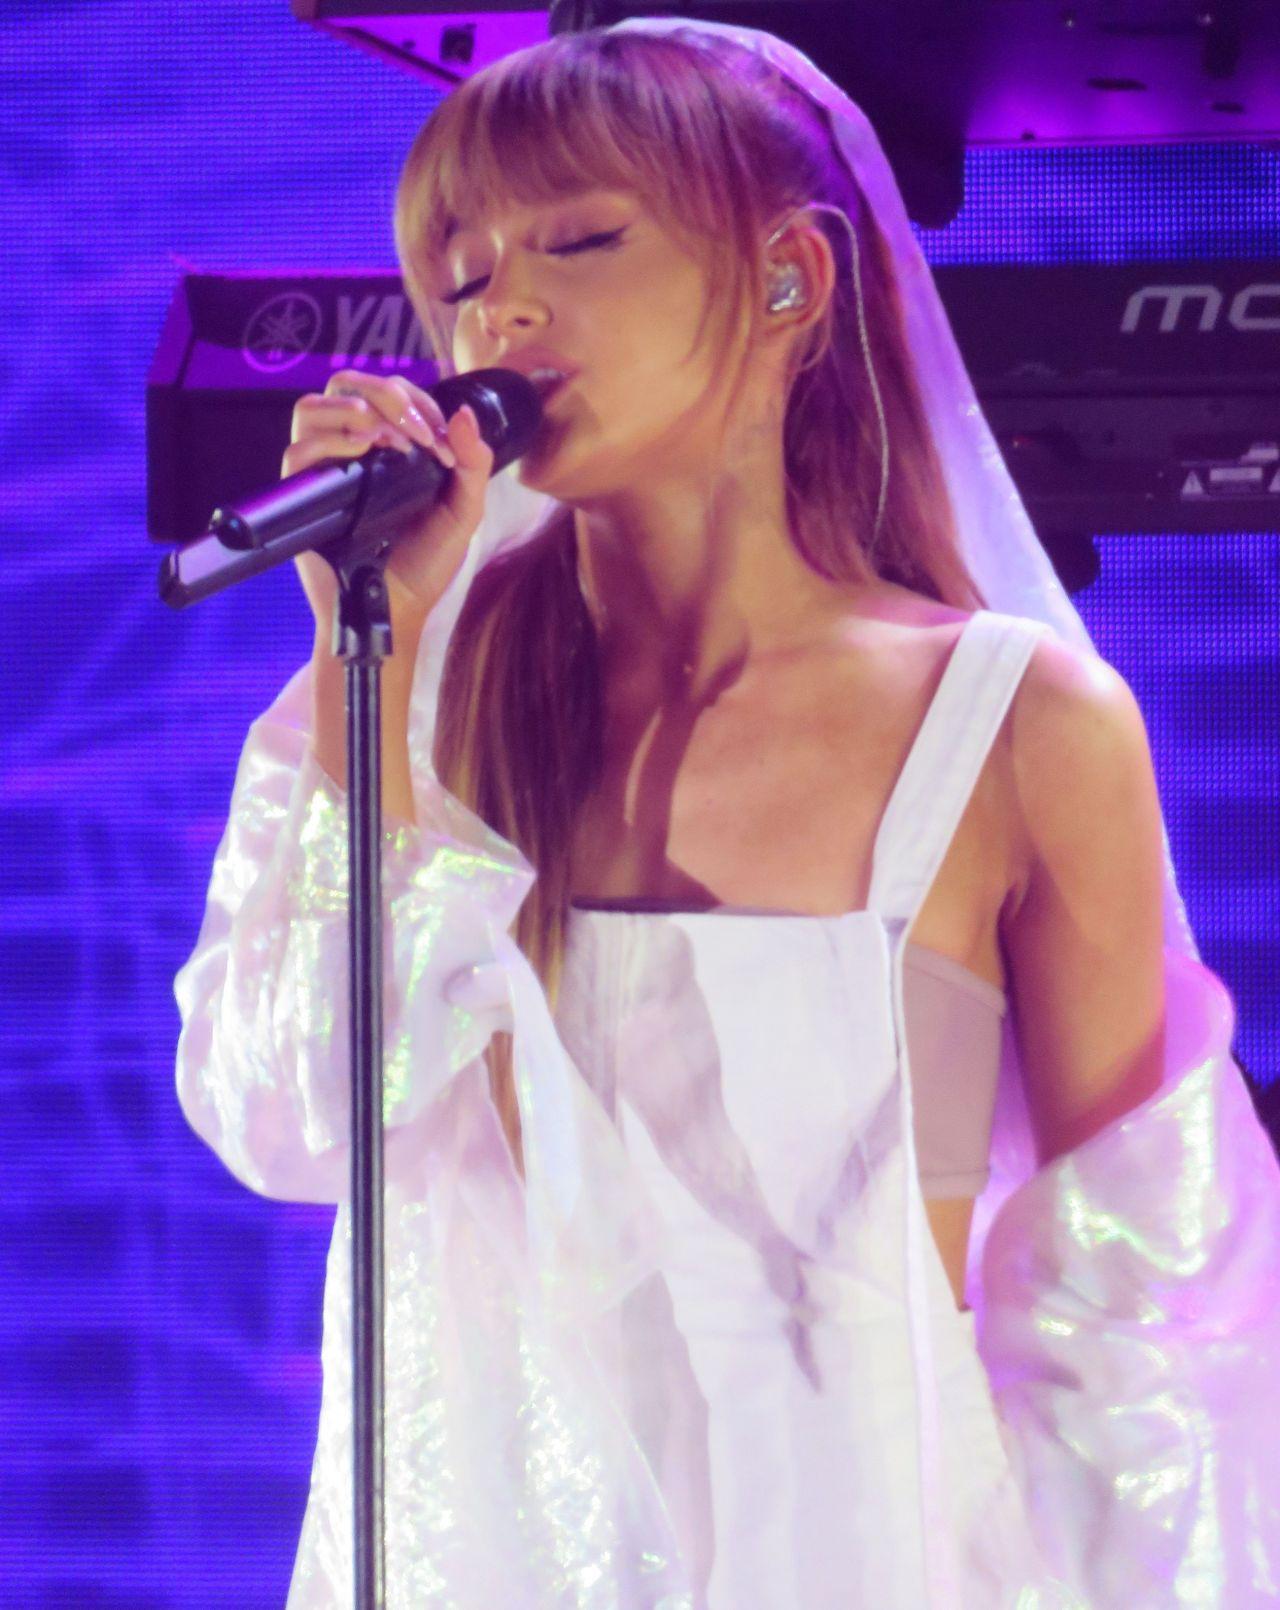 Ariana grande honeymoon avenue lyrics